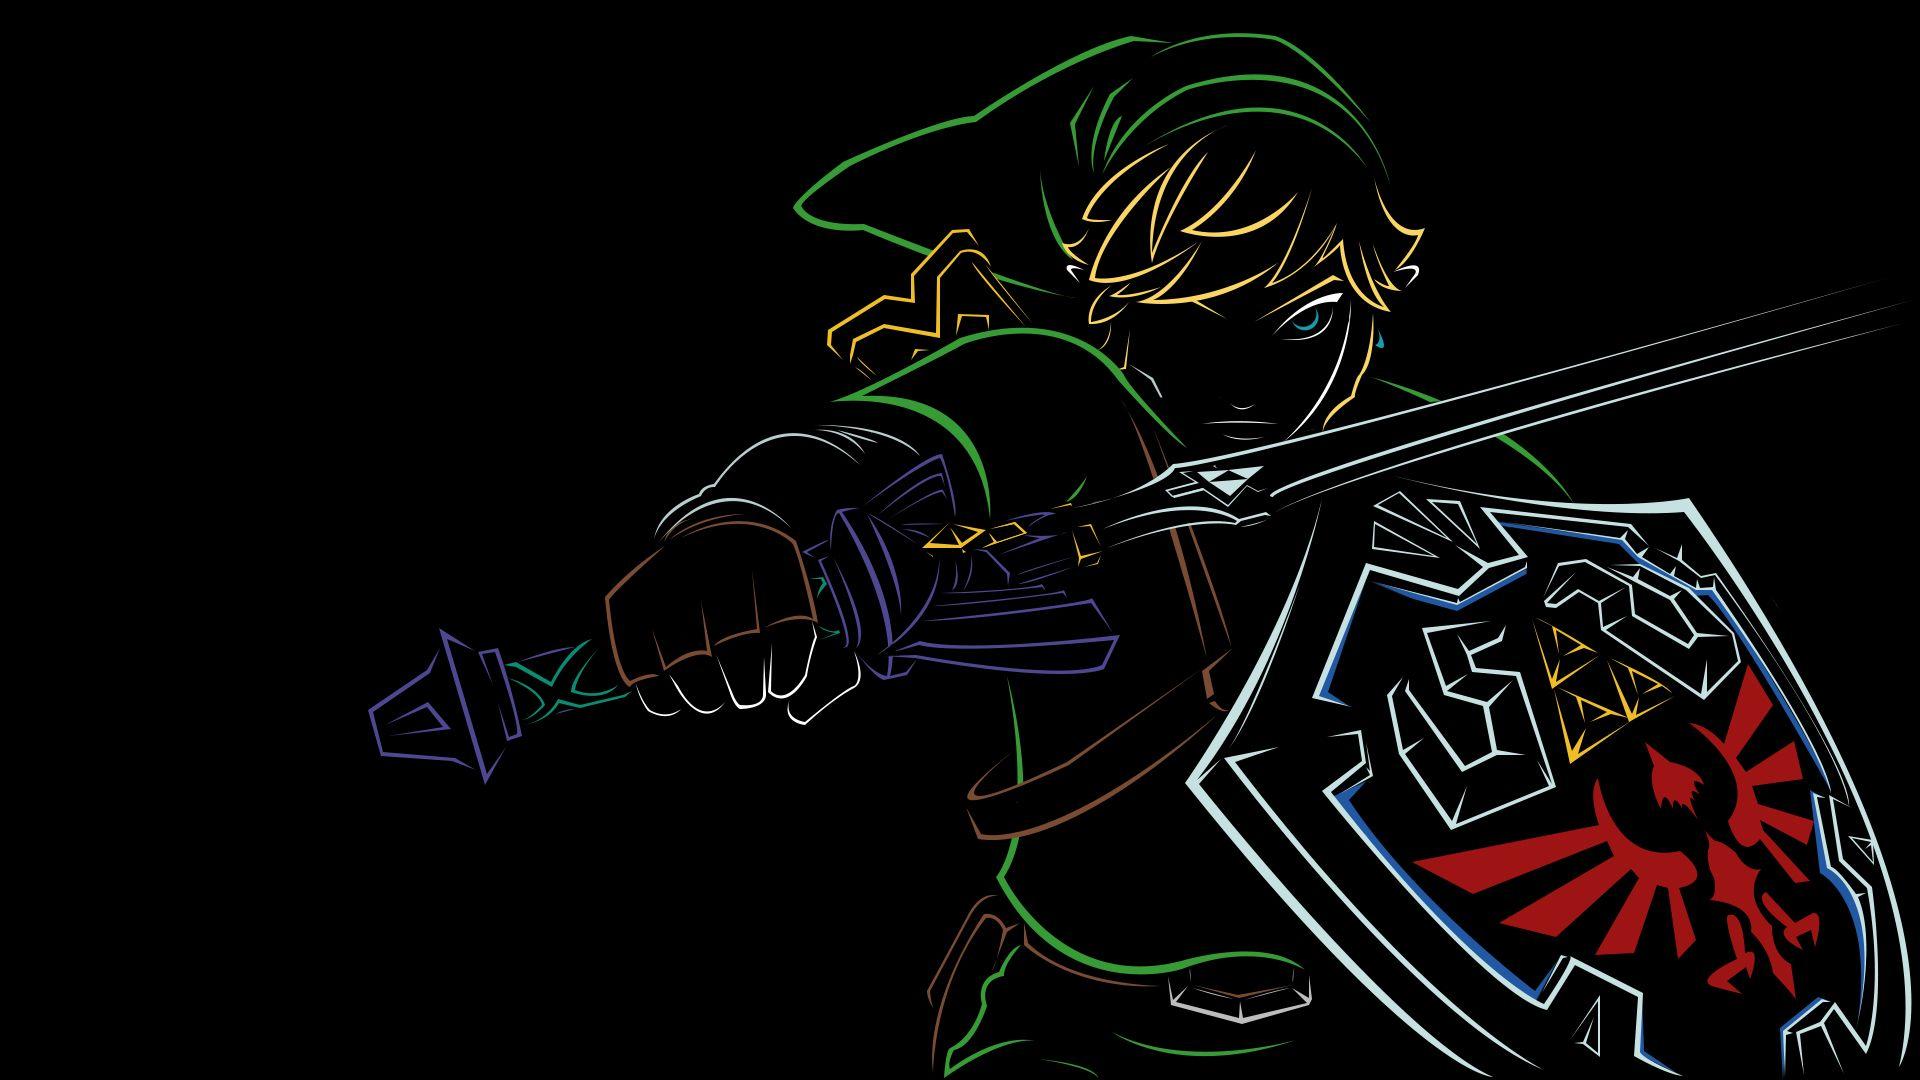 Link From Zelda Minimalist Outline Wallpaper Legend Of